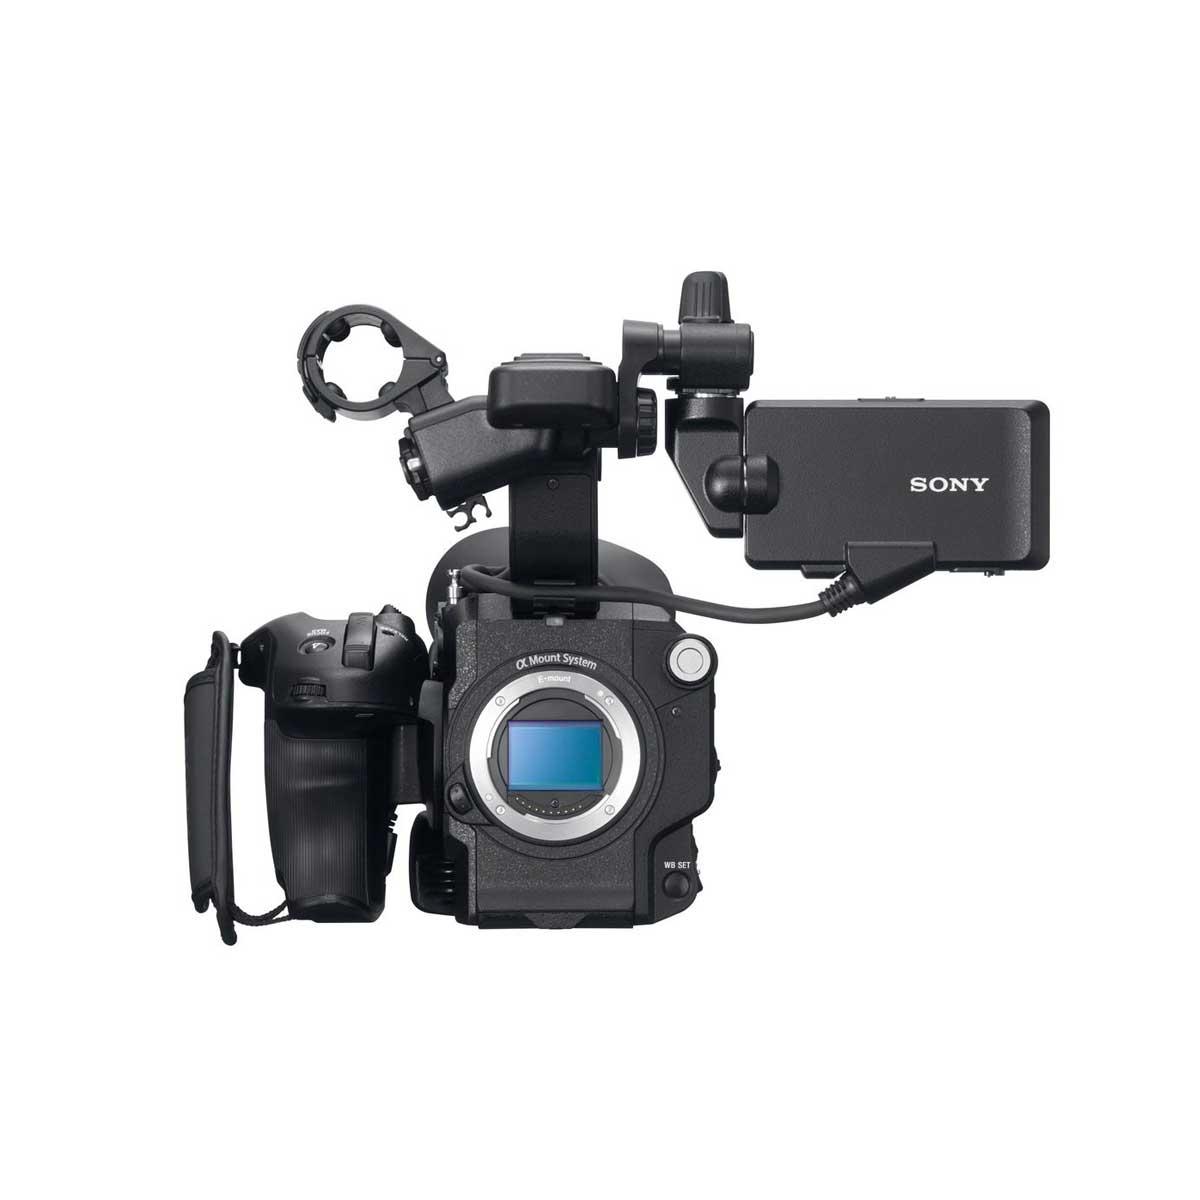 Sony Fs5 4k Camcorder W 18 105 Lens The Camera Exchange